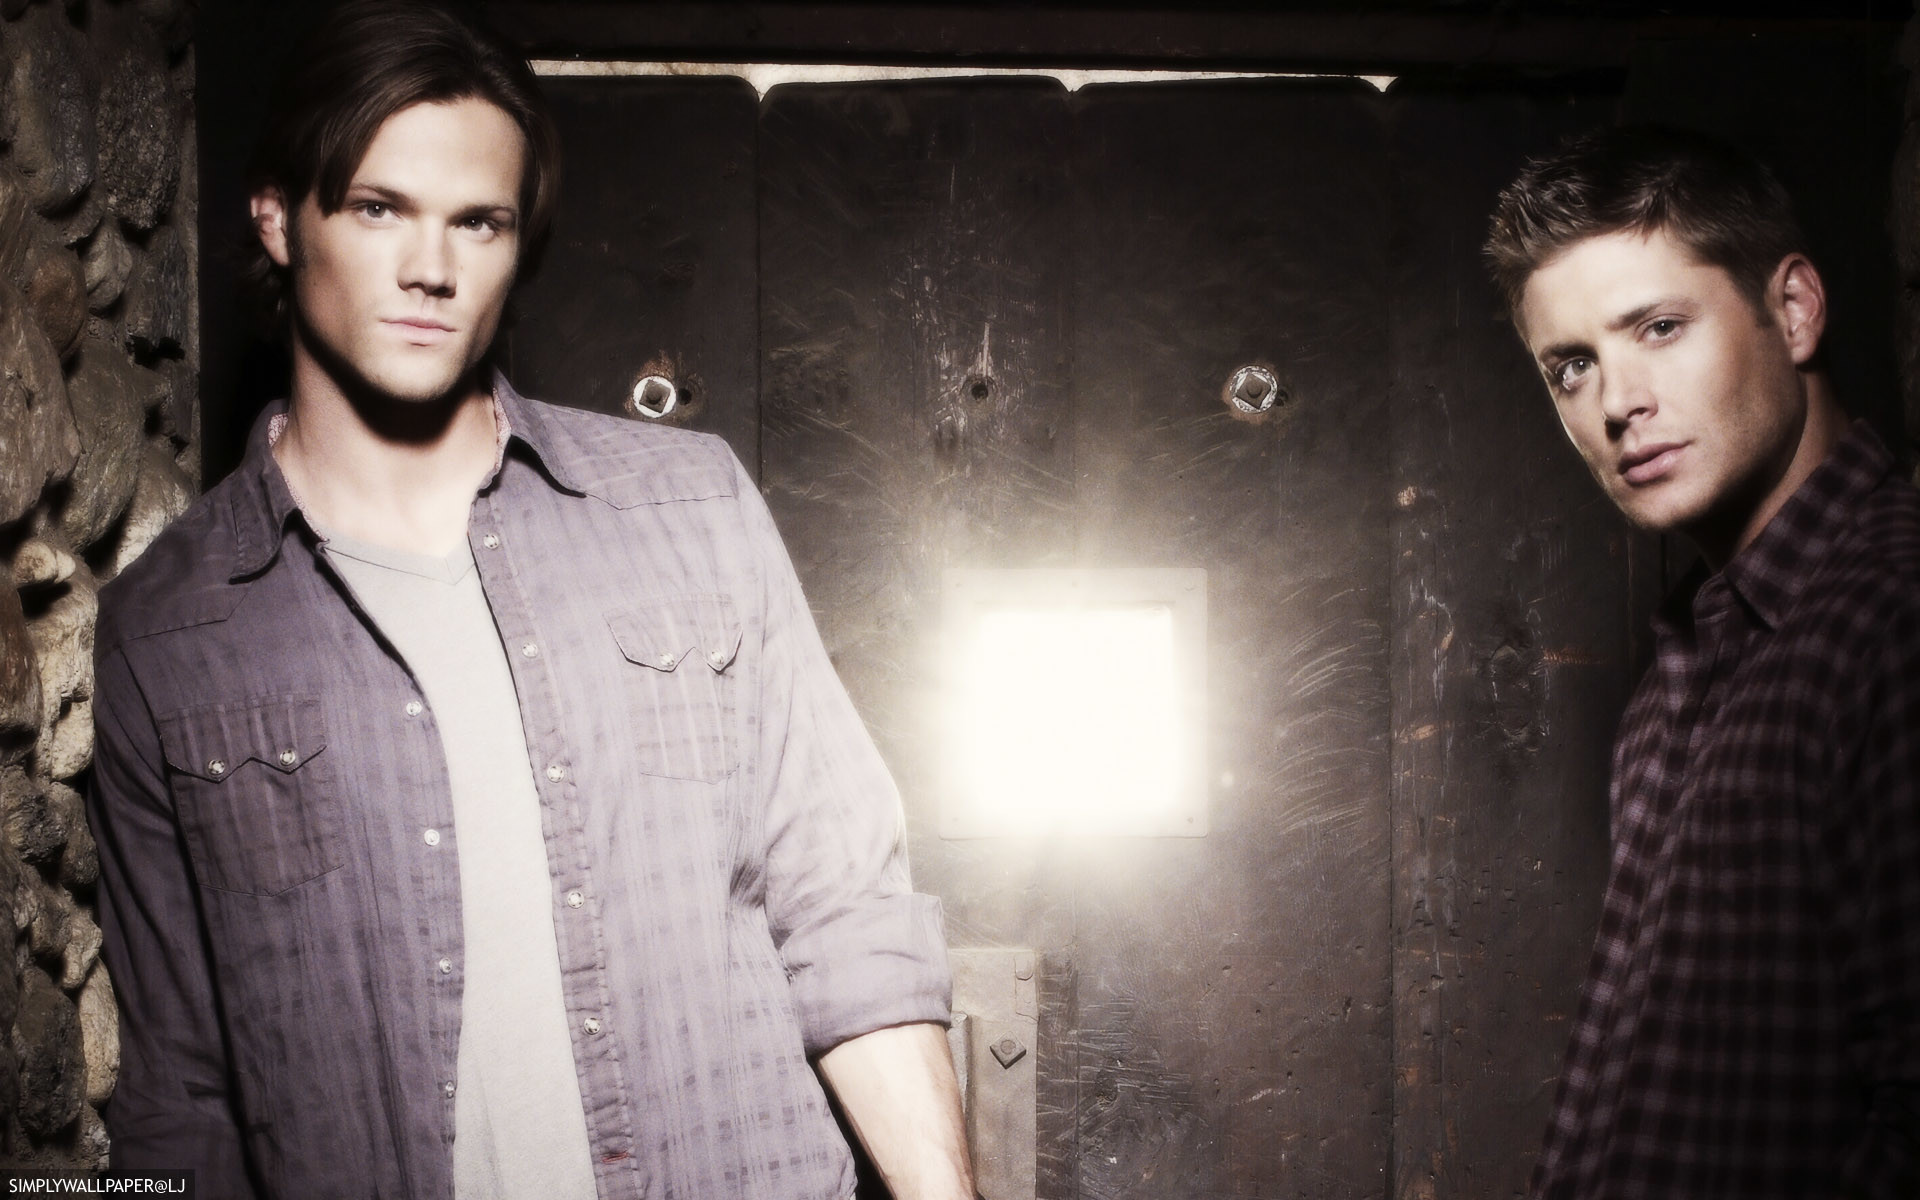 Supernatural desktop background / wallpaper – Sam and Dean Winchester –  credit: simplywallpaper@historyjunkie